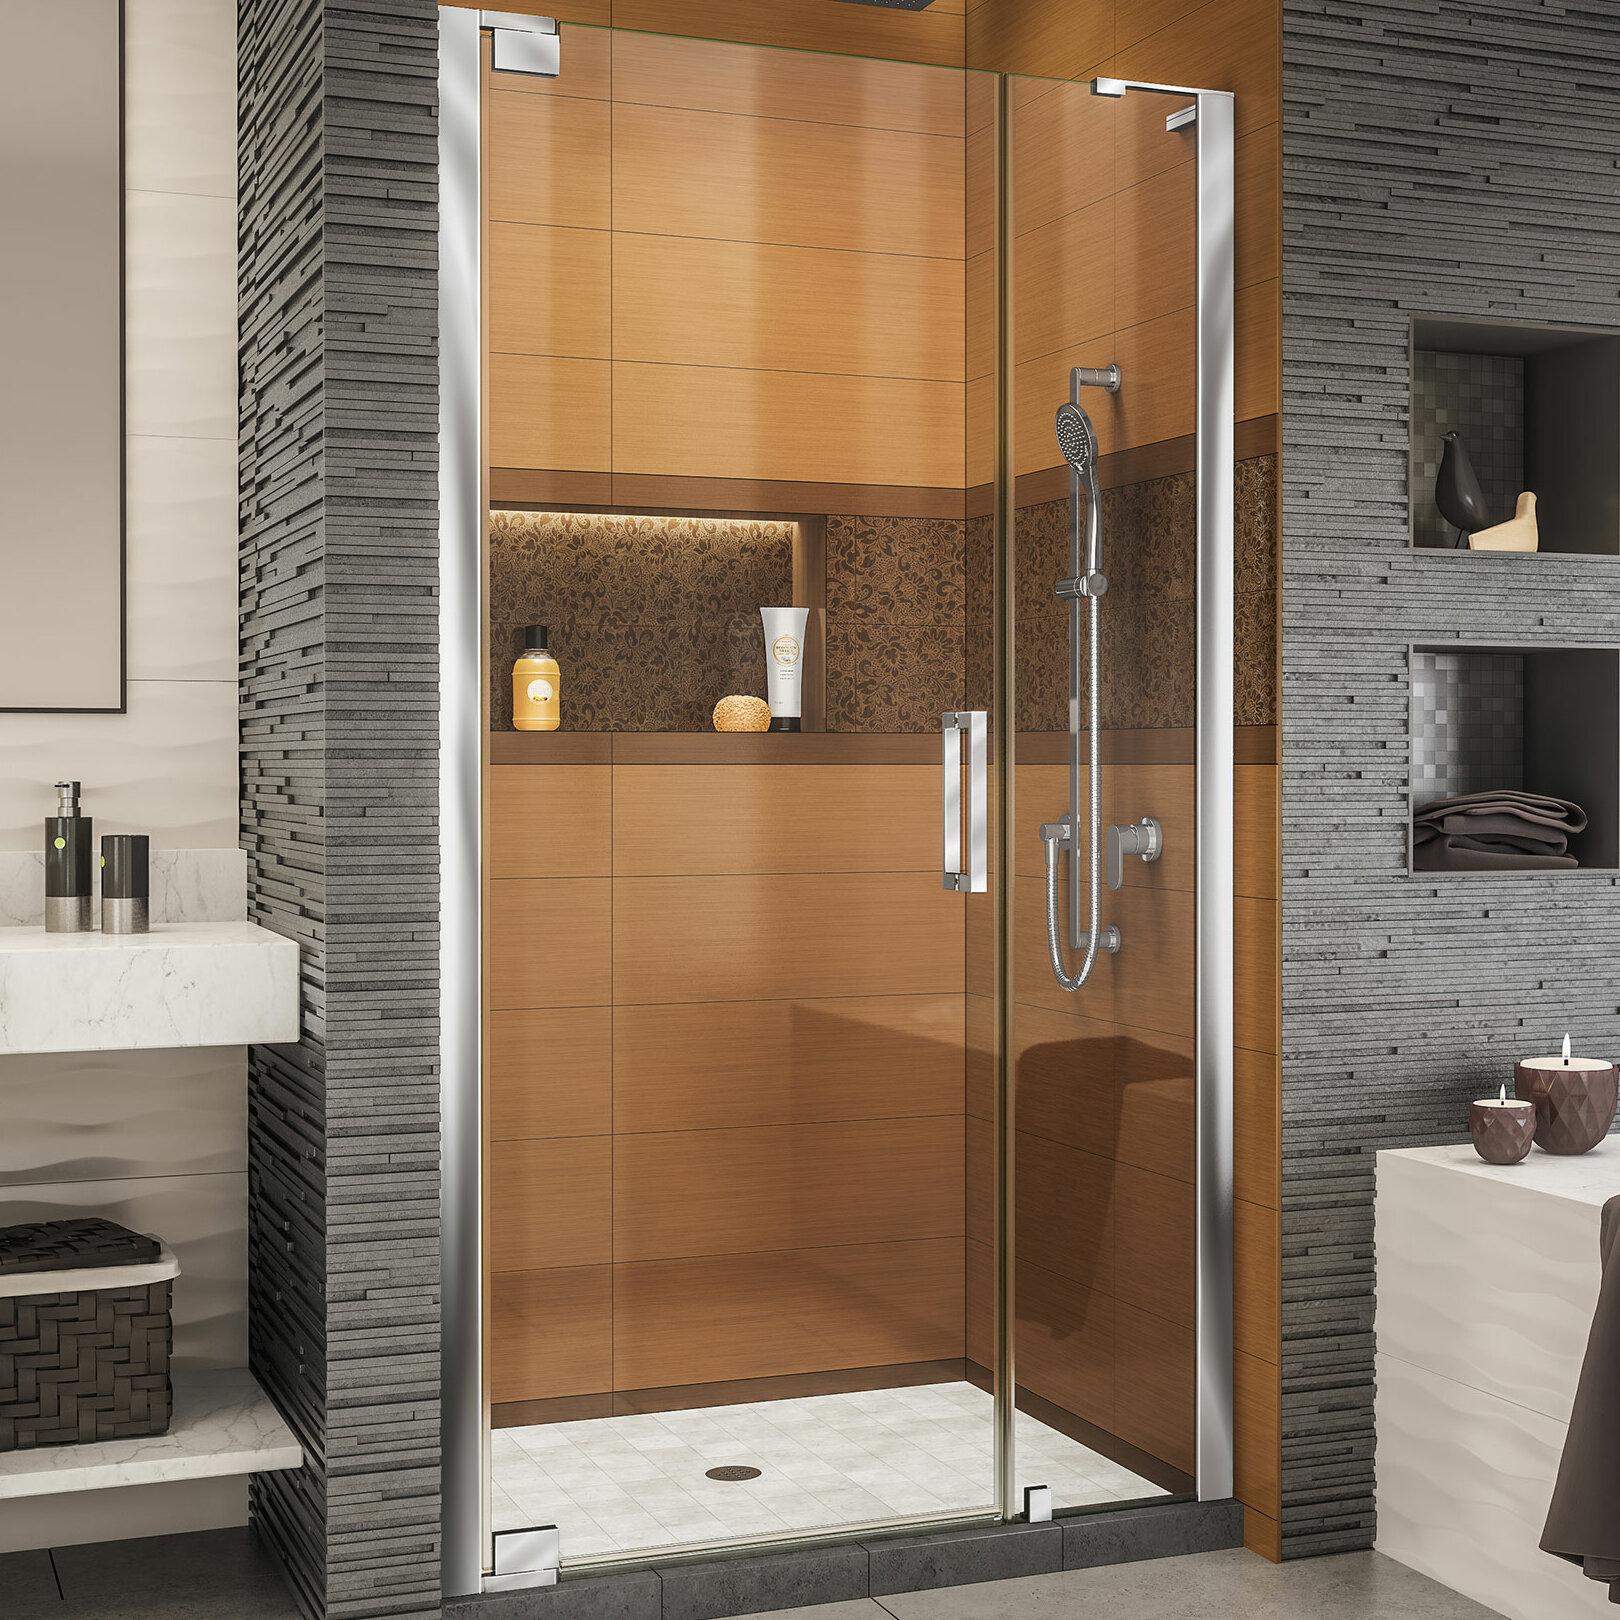 Elegance Ls 44 25 X 72 Pivot Frameless Shower Door With Clearmax Technology